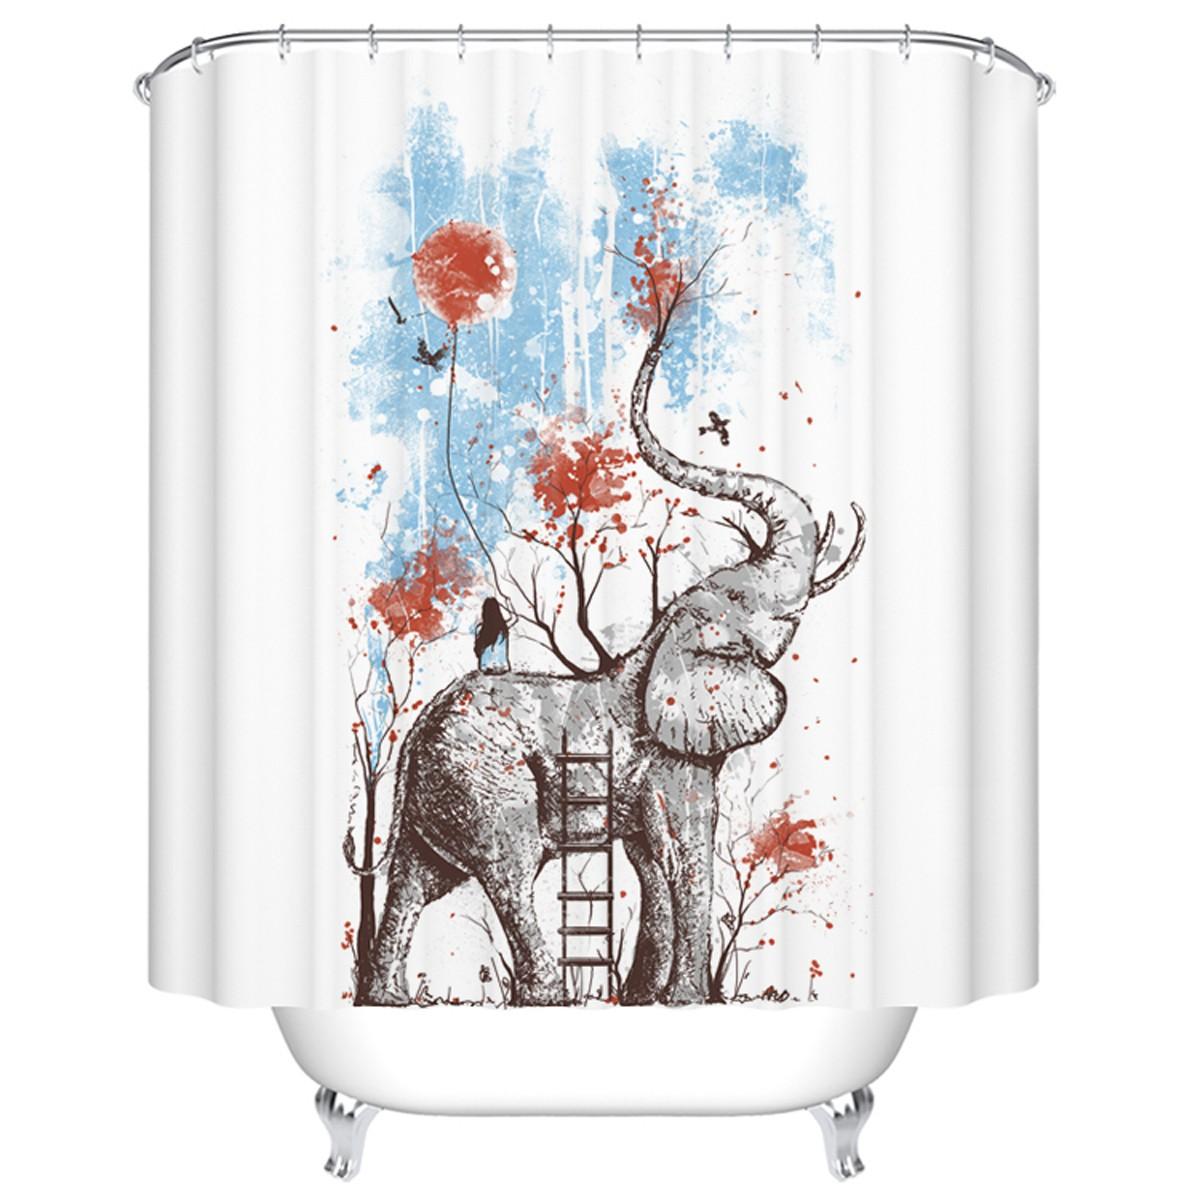 "Bathroom Waterproof Shower Curtain, 70"" W x 72"" H (DK-YT018)"